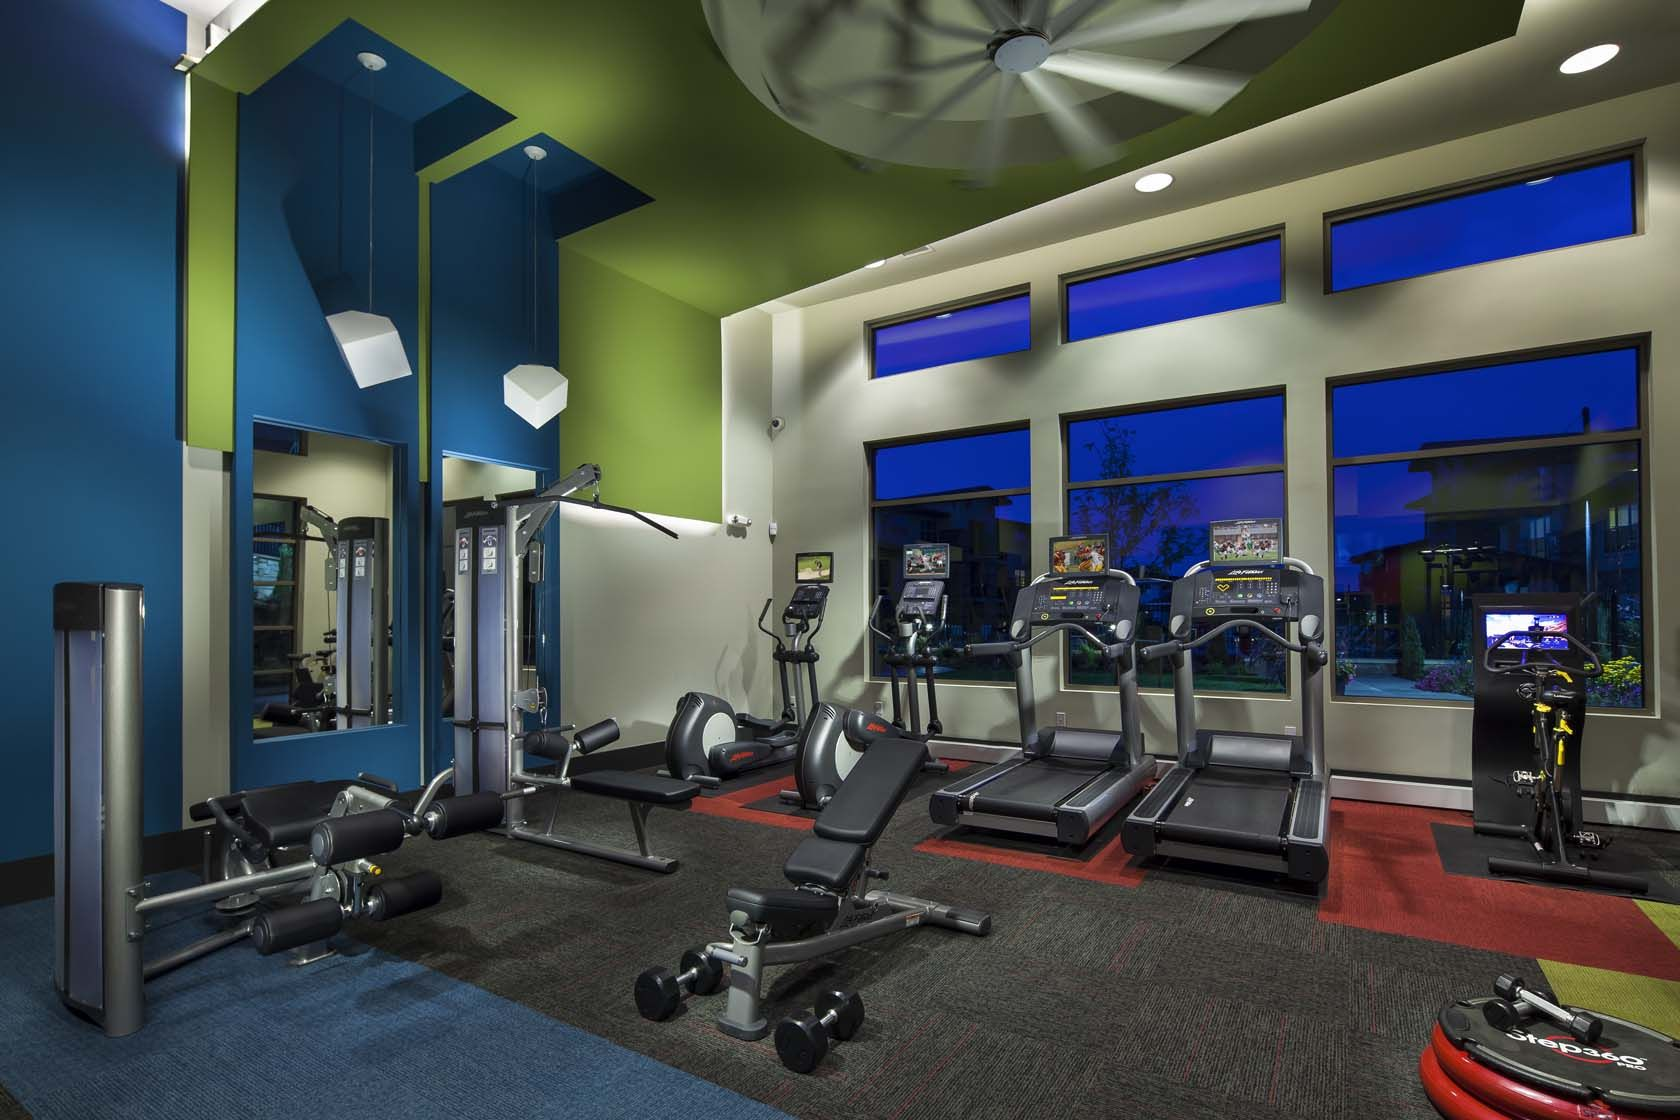 Fitness Center Looks Cool But Needs A More Campy Feel Gym Interior Gym Design Wellness Design